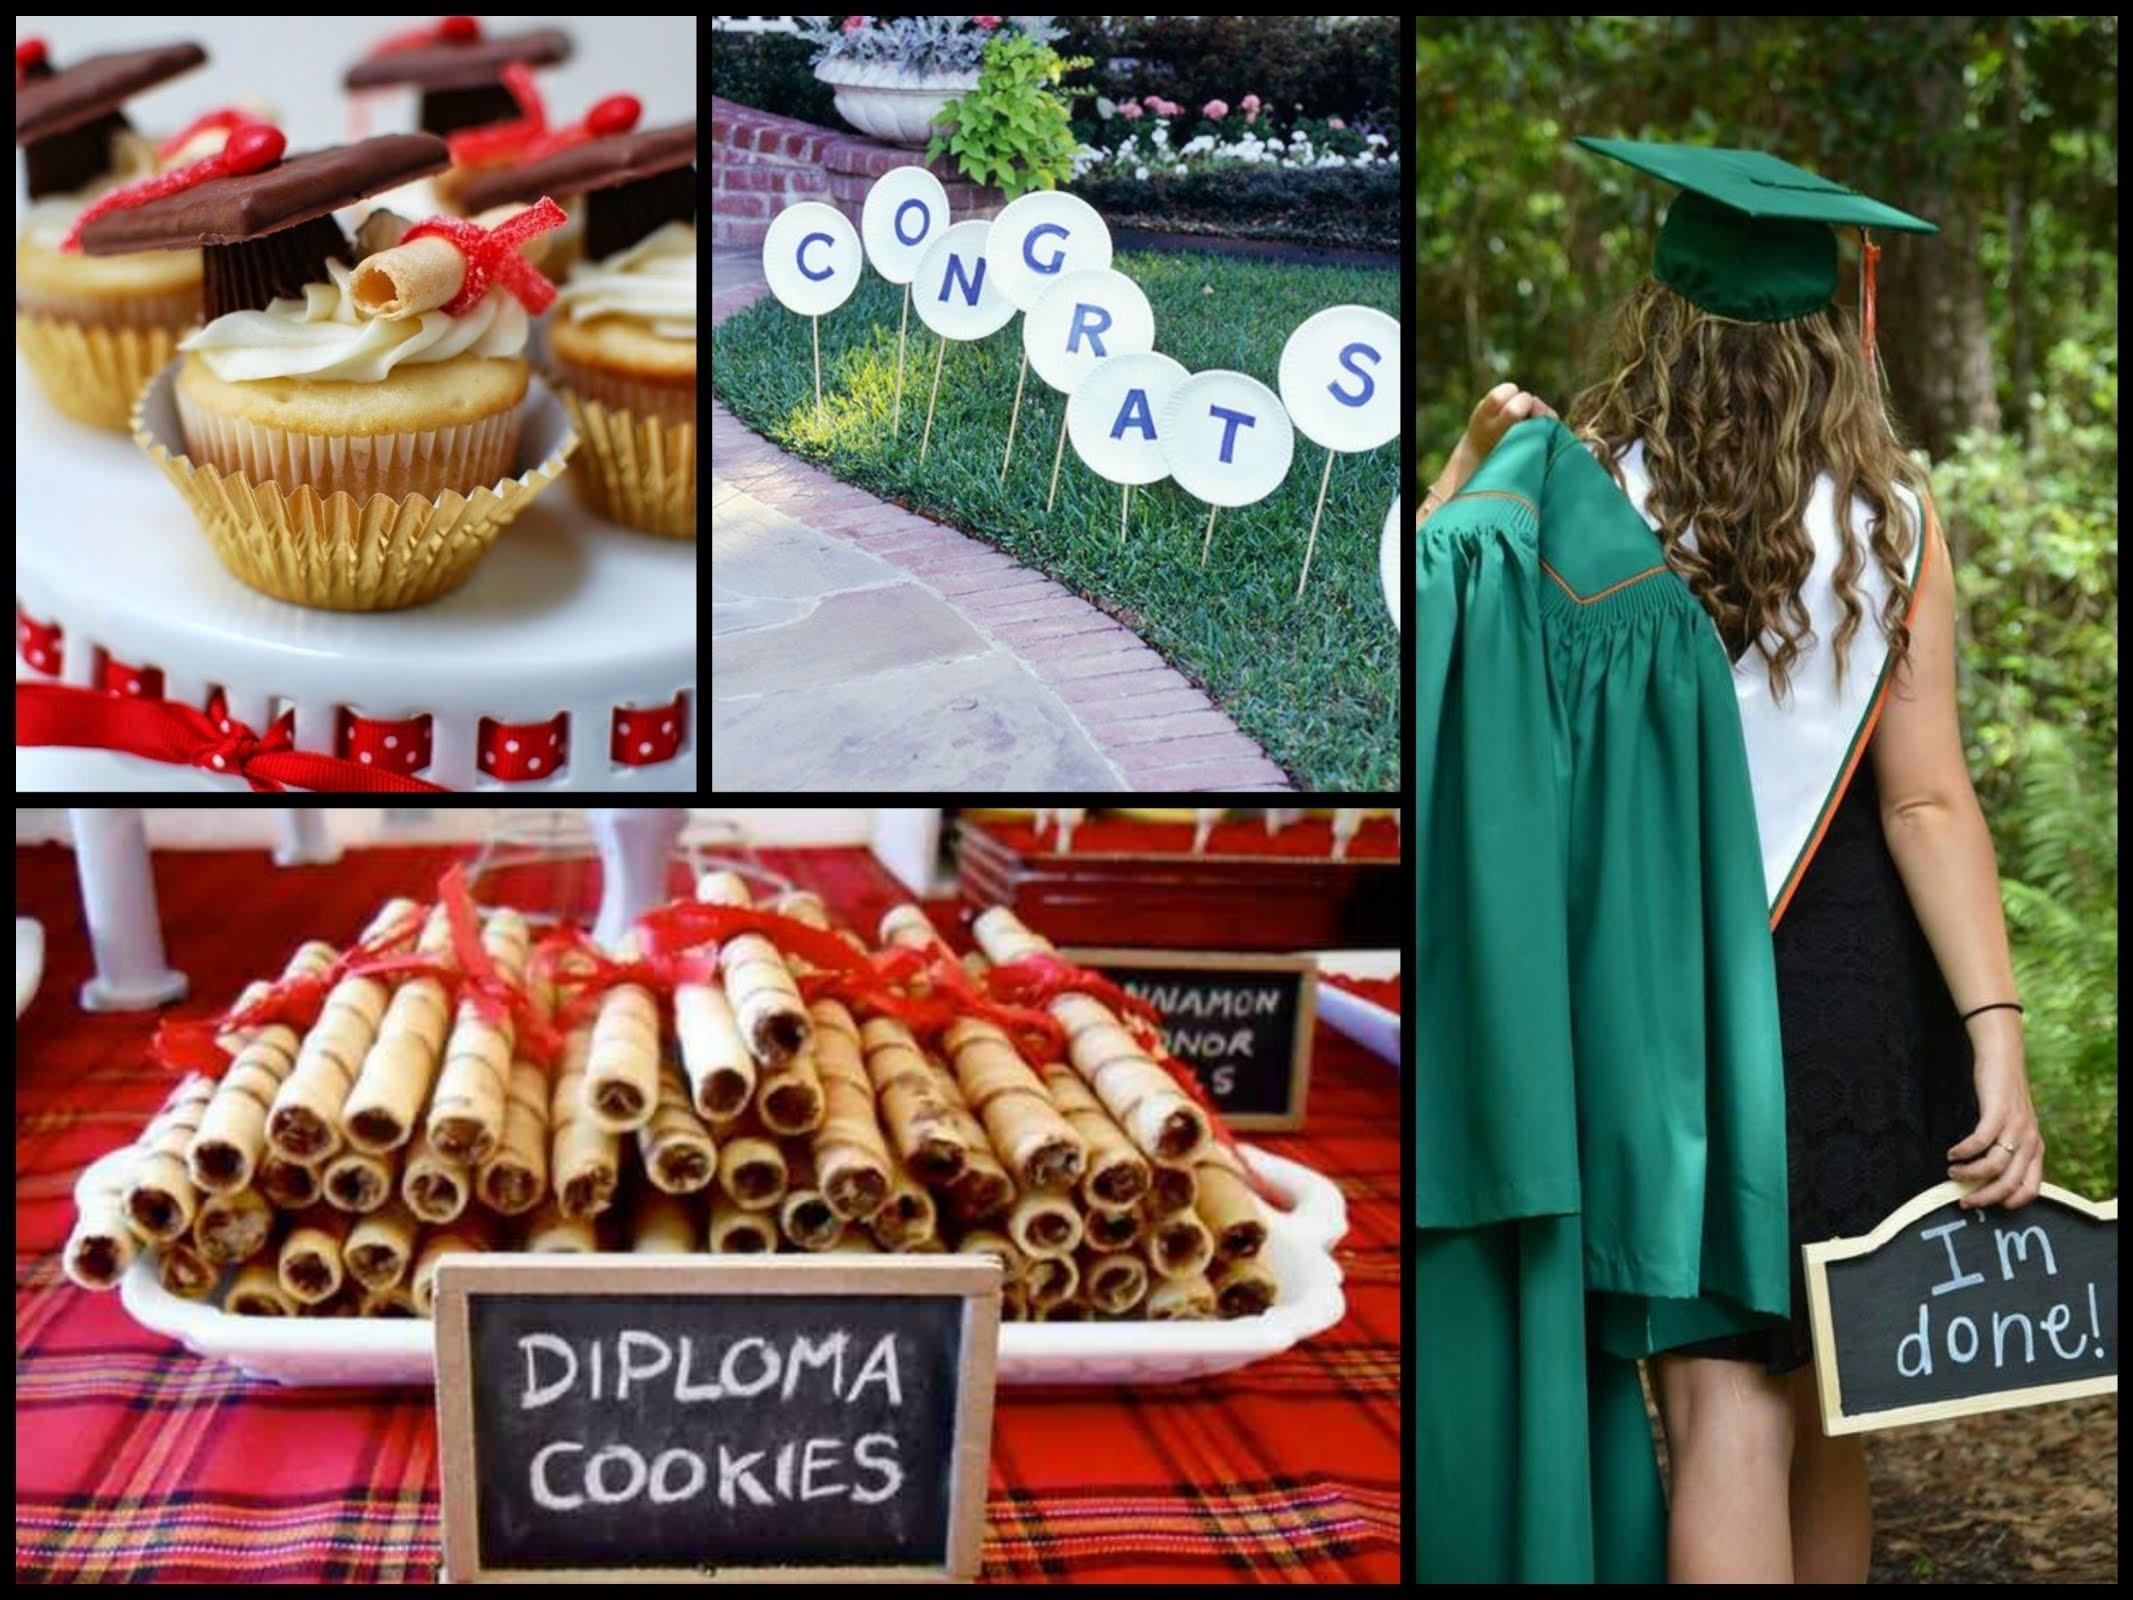 10 Awesome Graduation Open House Food Ideas 25 diy graduation party ideas youtube 1 2020